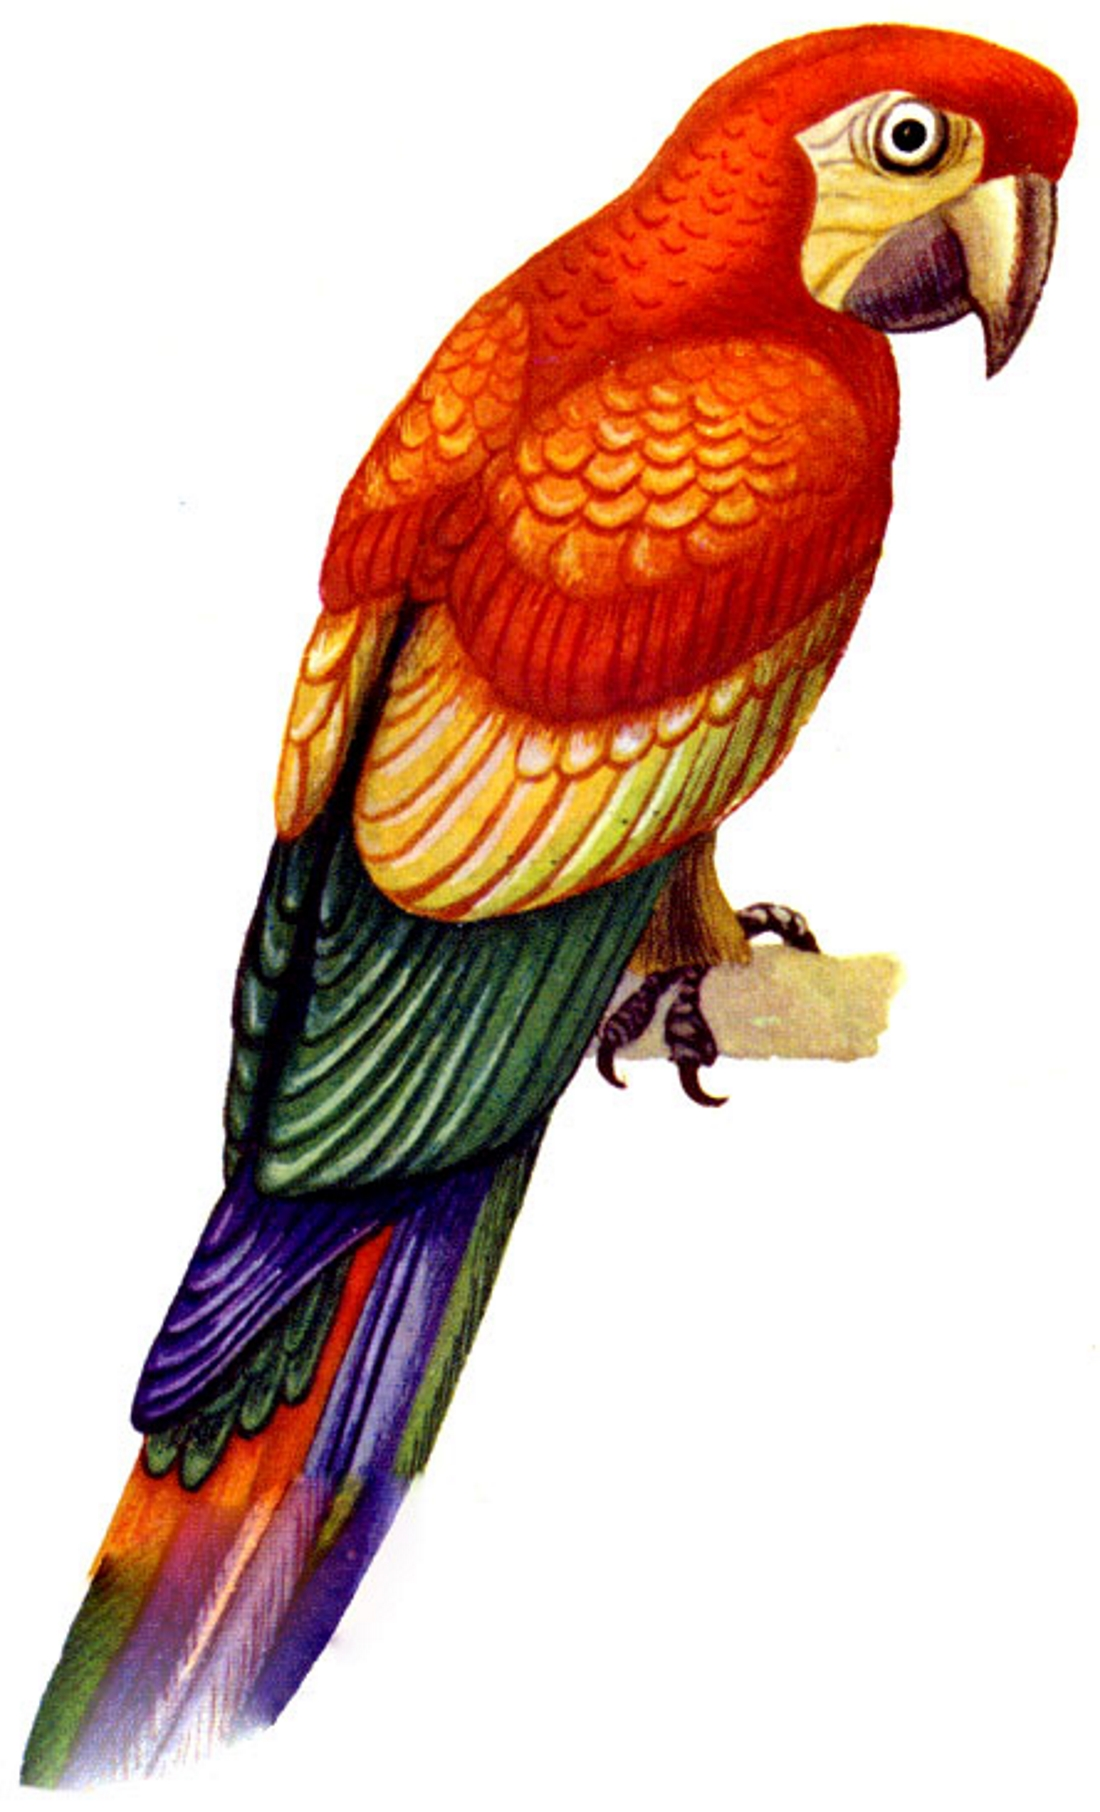 Картинка попугая - картинка №11907 | Printonic.ru